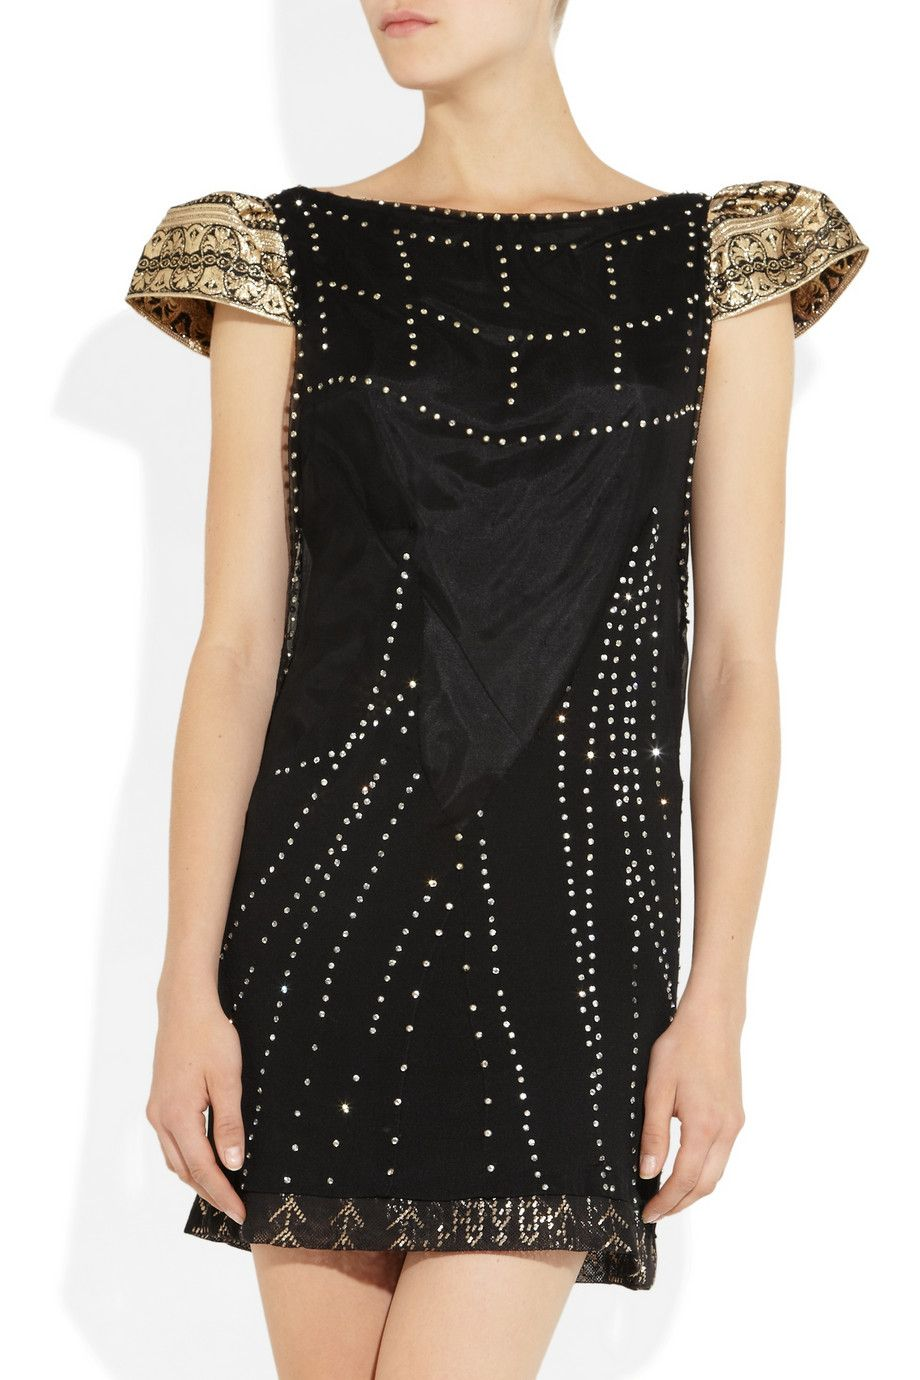 One Vintage|Jeana dress